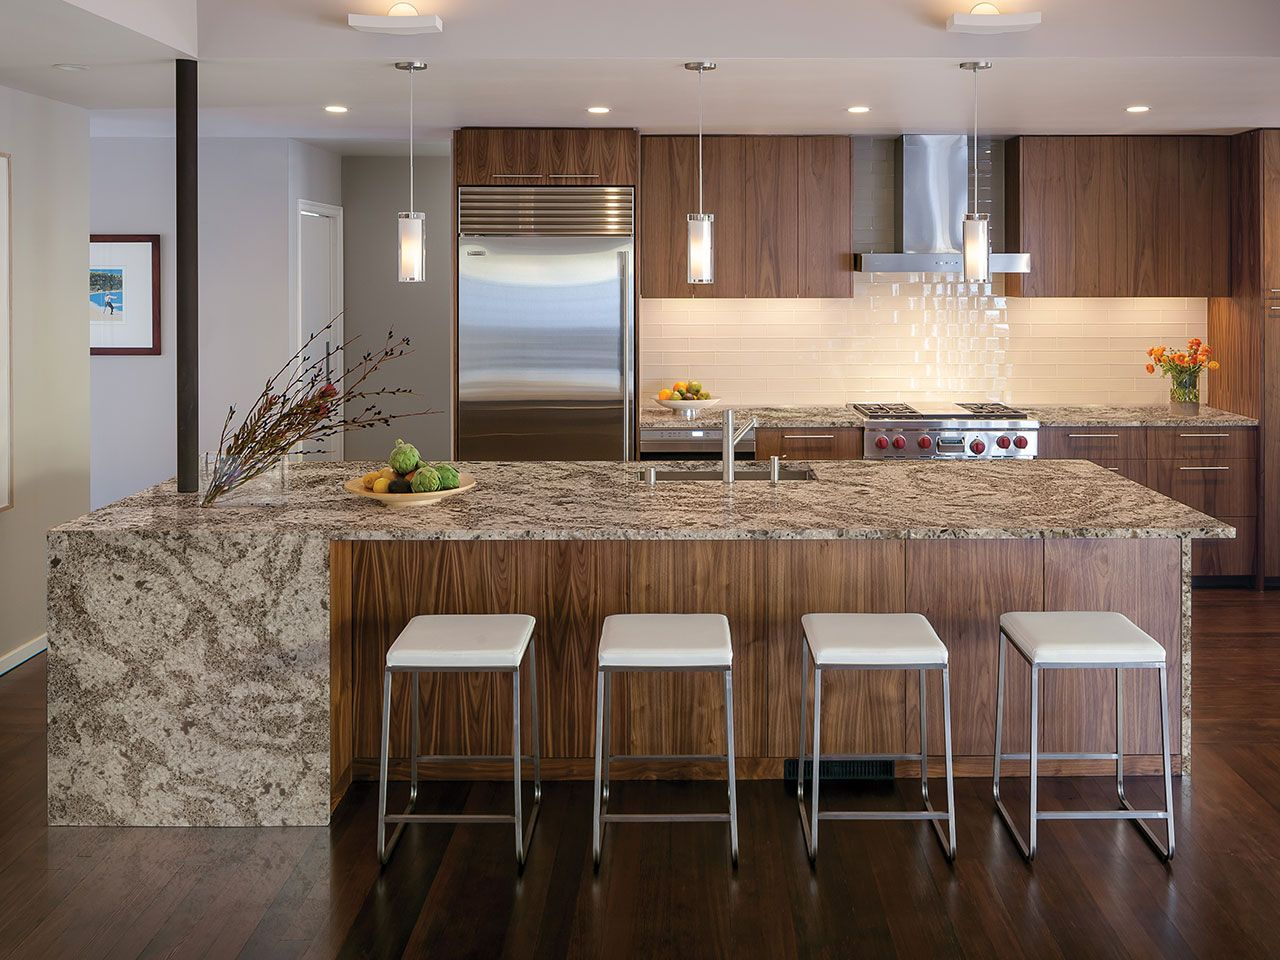 Galloway By Cambria Quartz Kitchen Design Gallery Kitchen Design Contemporary Kitchen